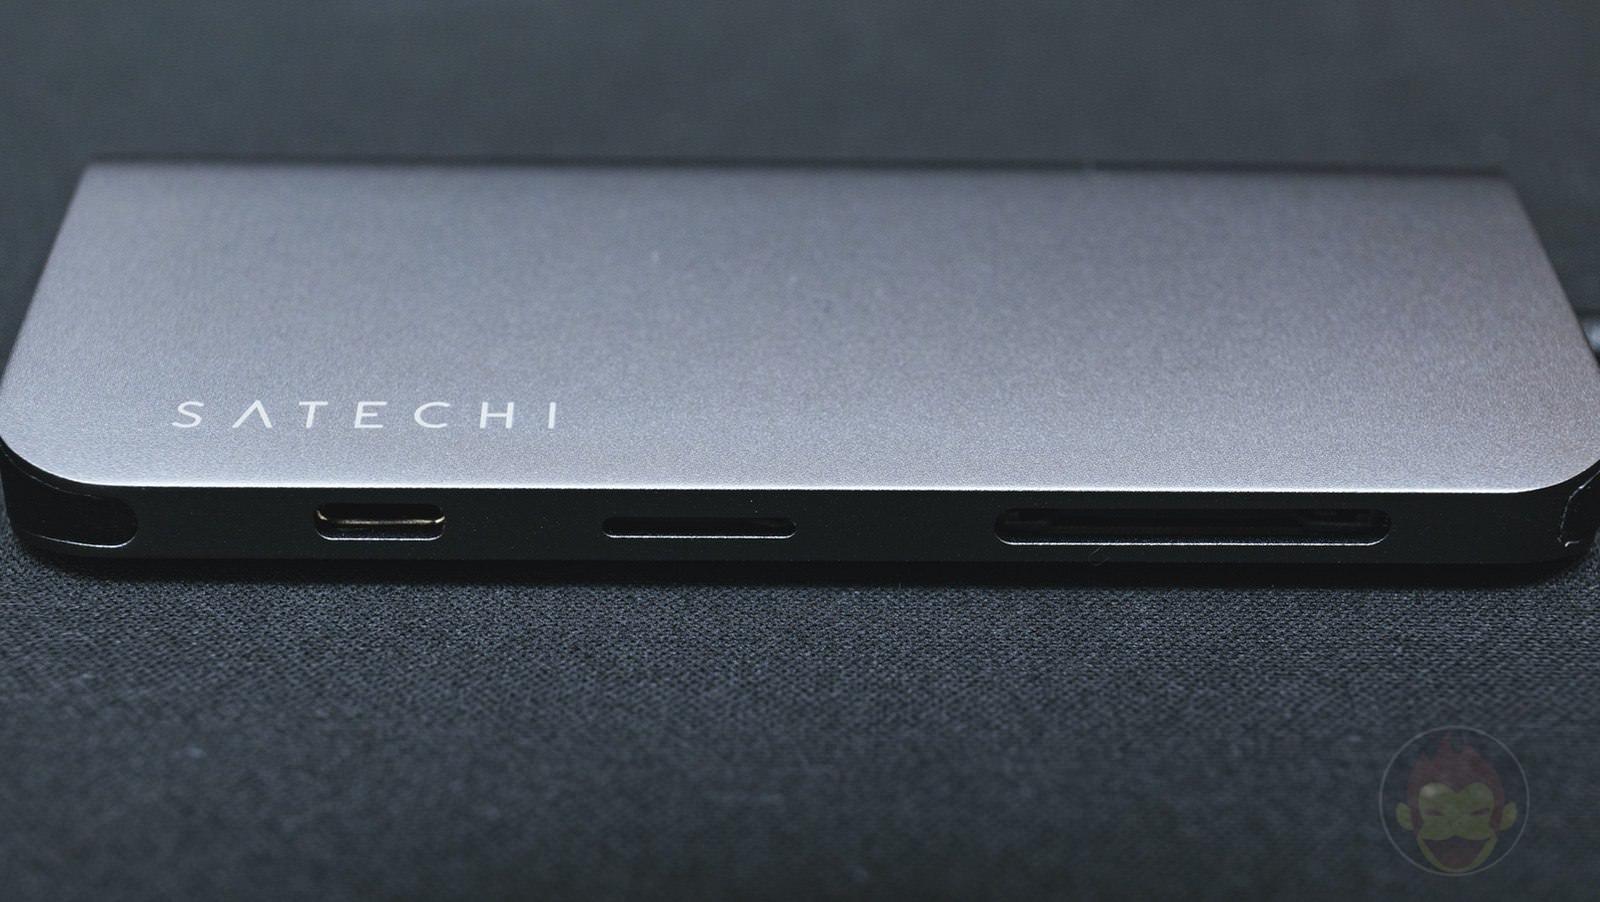 Satechi-Aluminium-TypeC-Multimedia-Adapter-4KHDMI-MiniDisplayPort-01.jpg